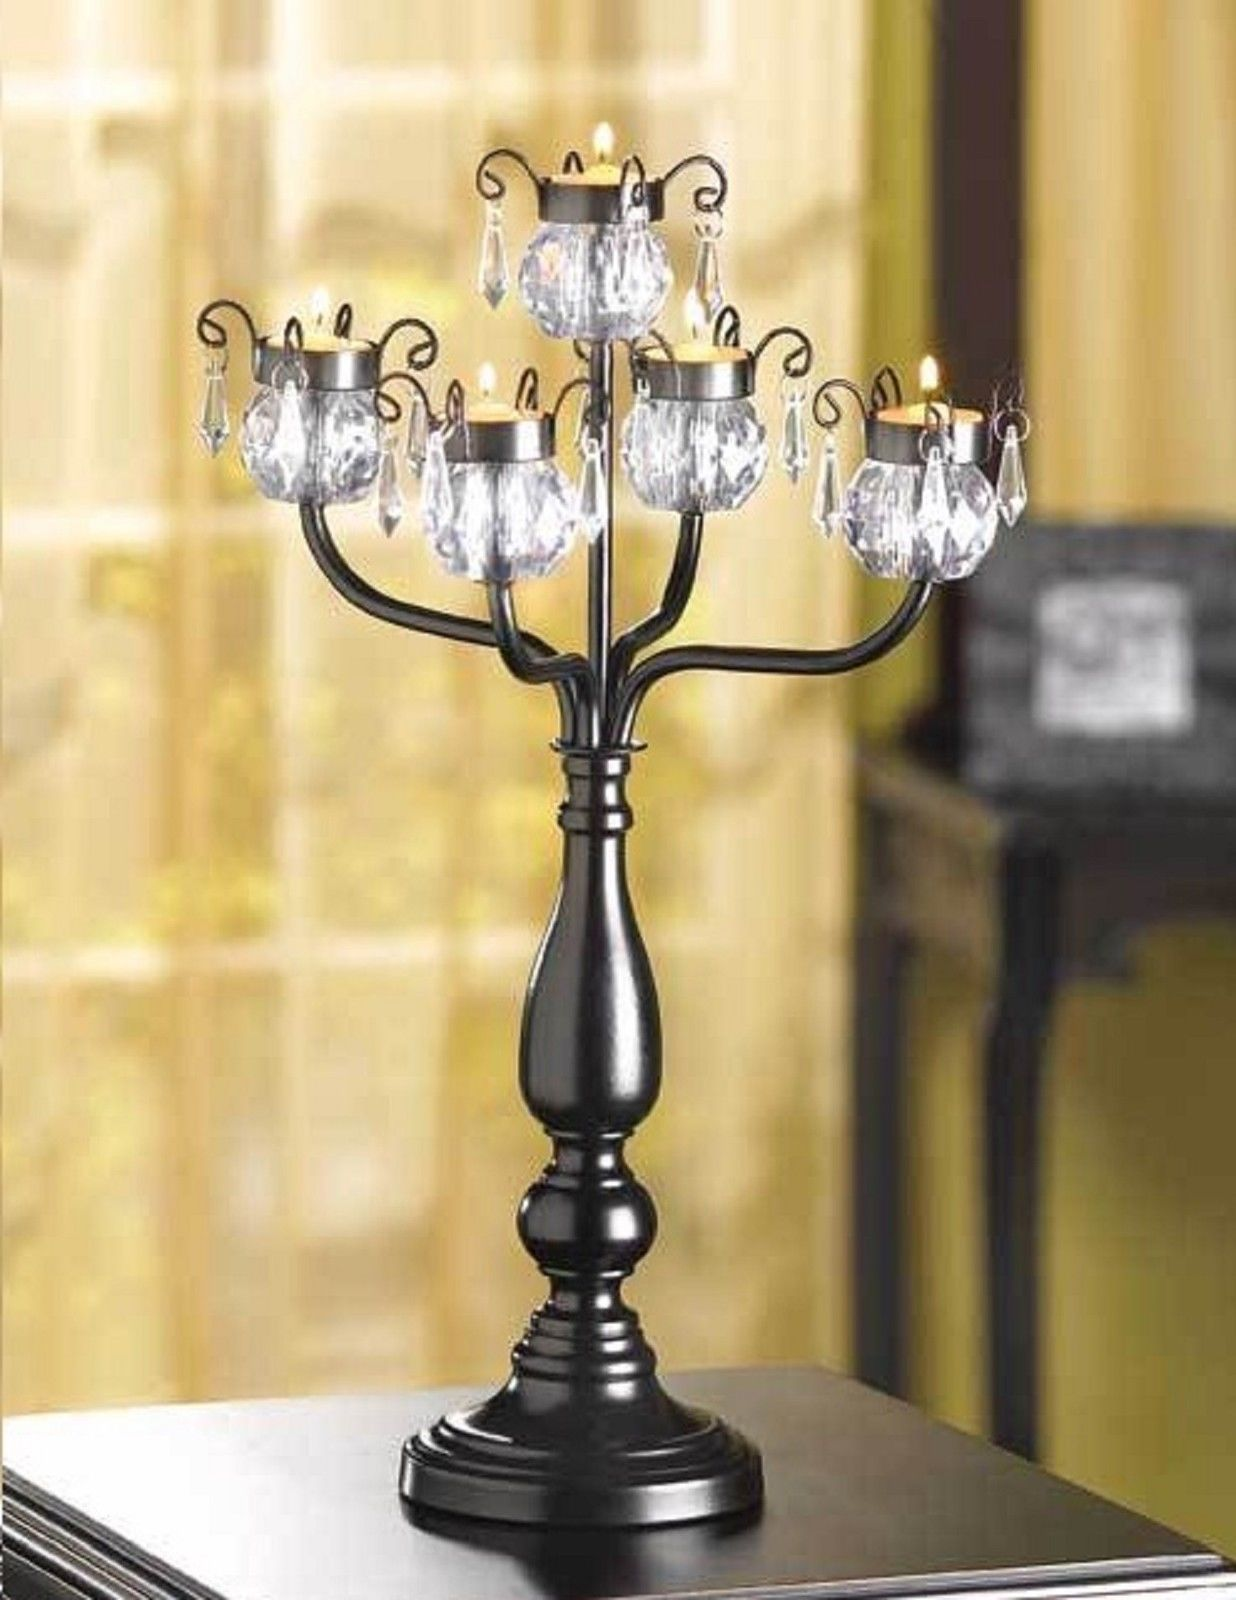 20 Crystal Tree Candelabra Black Candleholder Wedding Centerpieces image 2